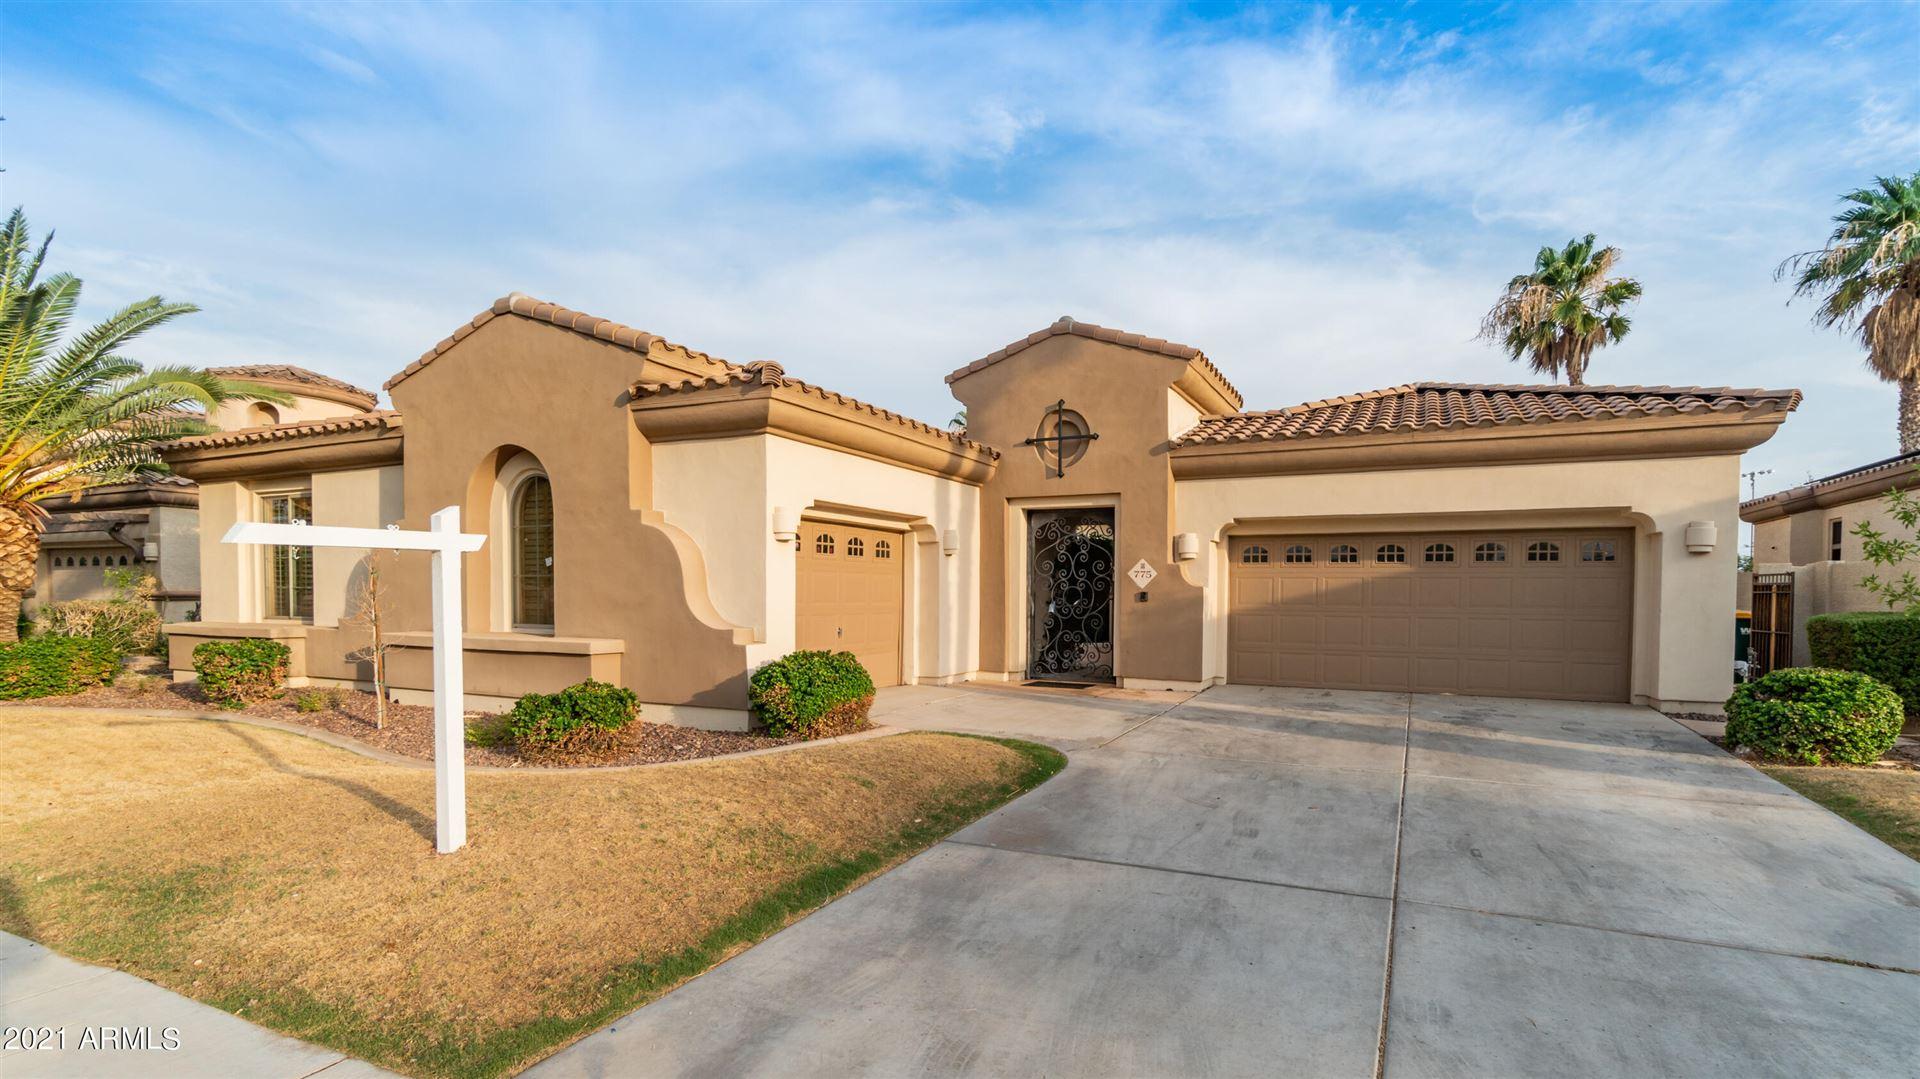 Photo of 775 W Azure Lane, Litchfield Park, AZ 85340 (MLS # 6268363)